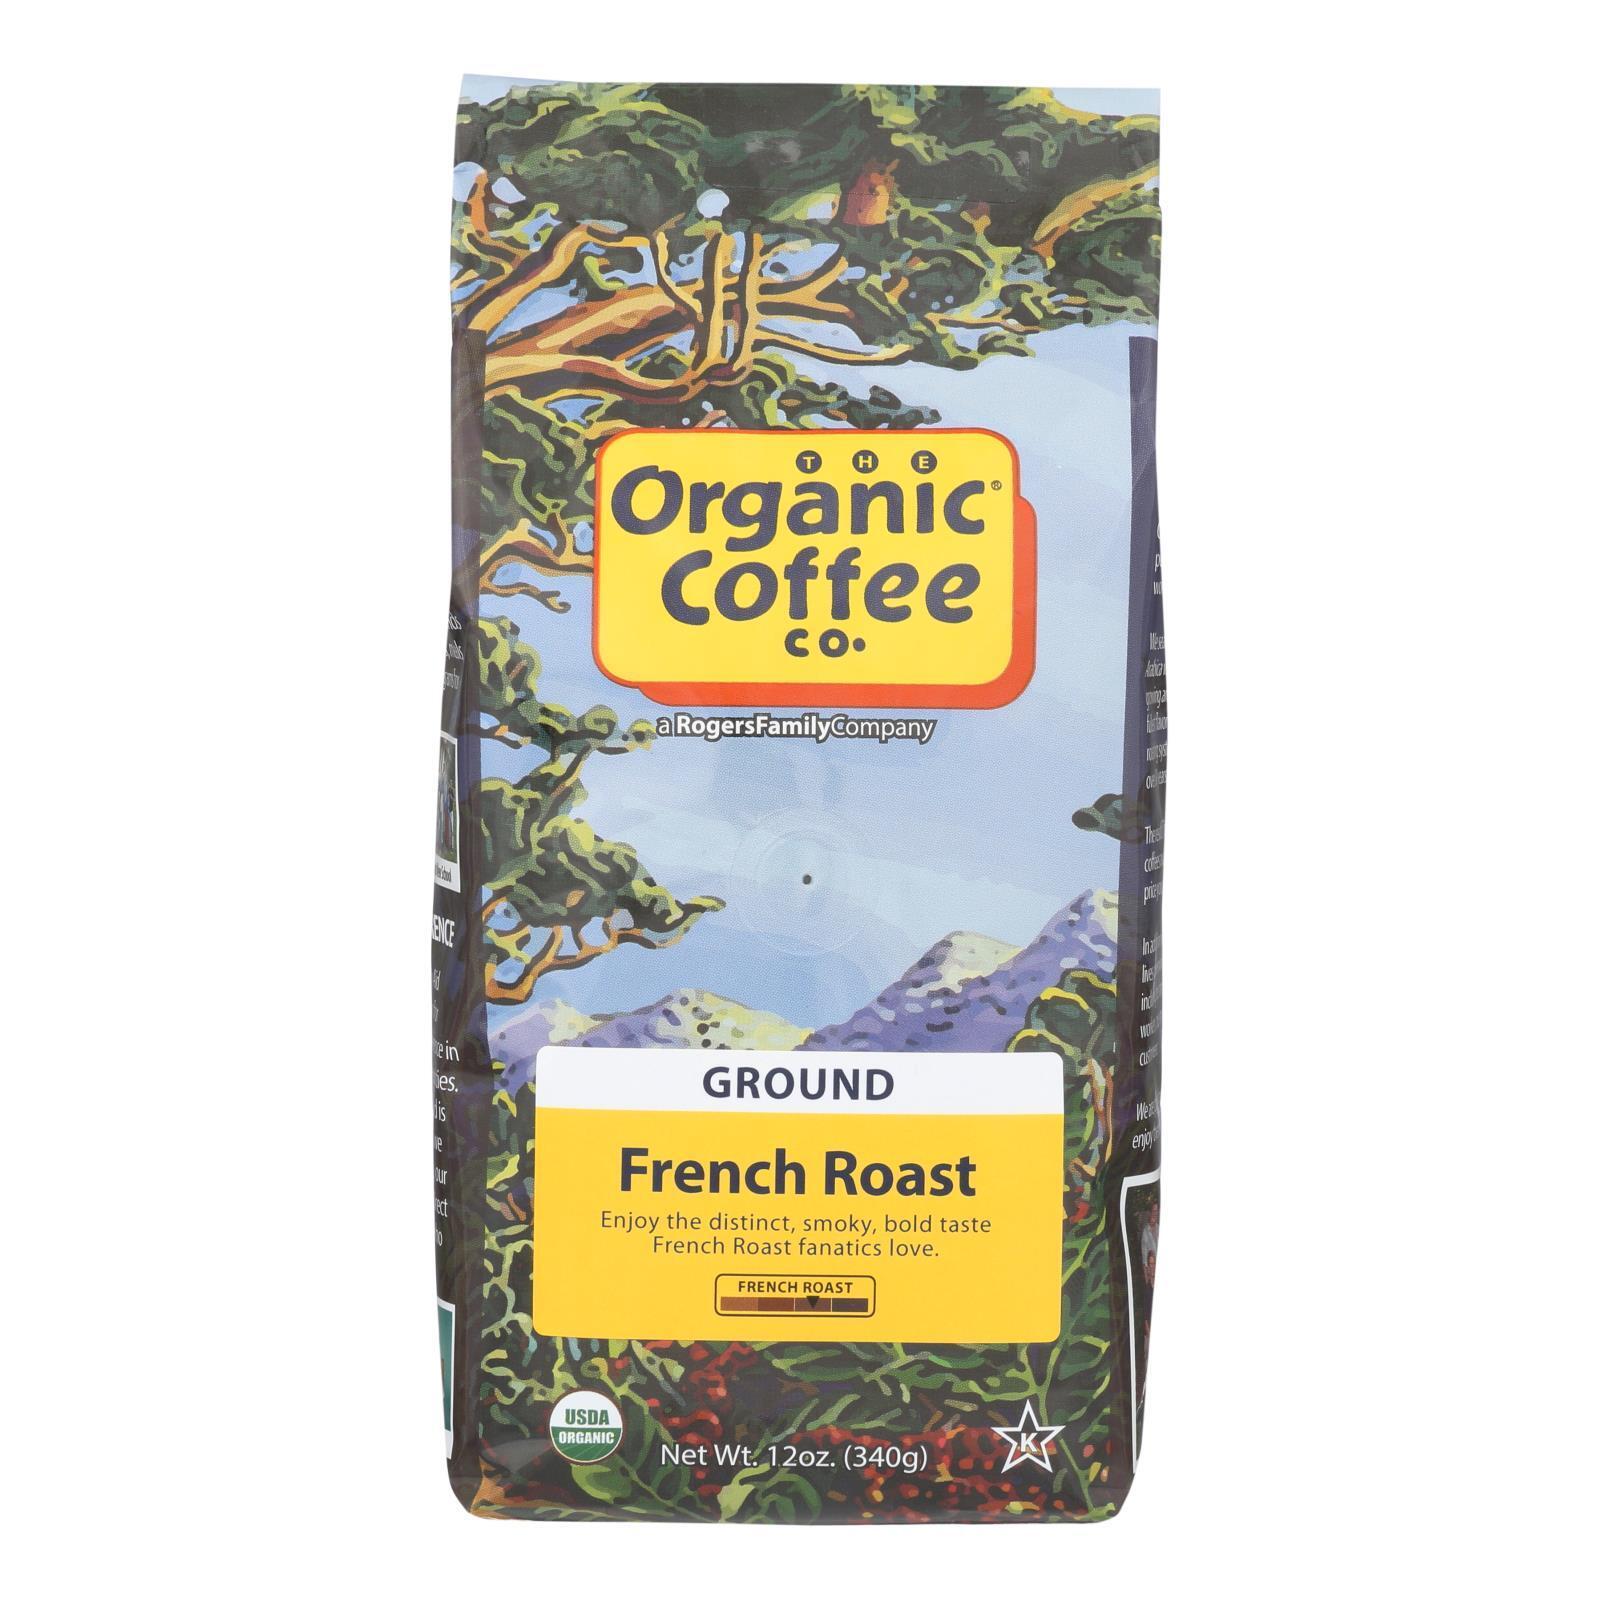 Organic Coffee Coffee - Organic - Ground - French Roast - 12 oz - case of 6